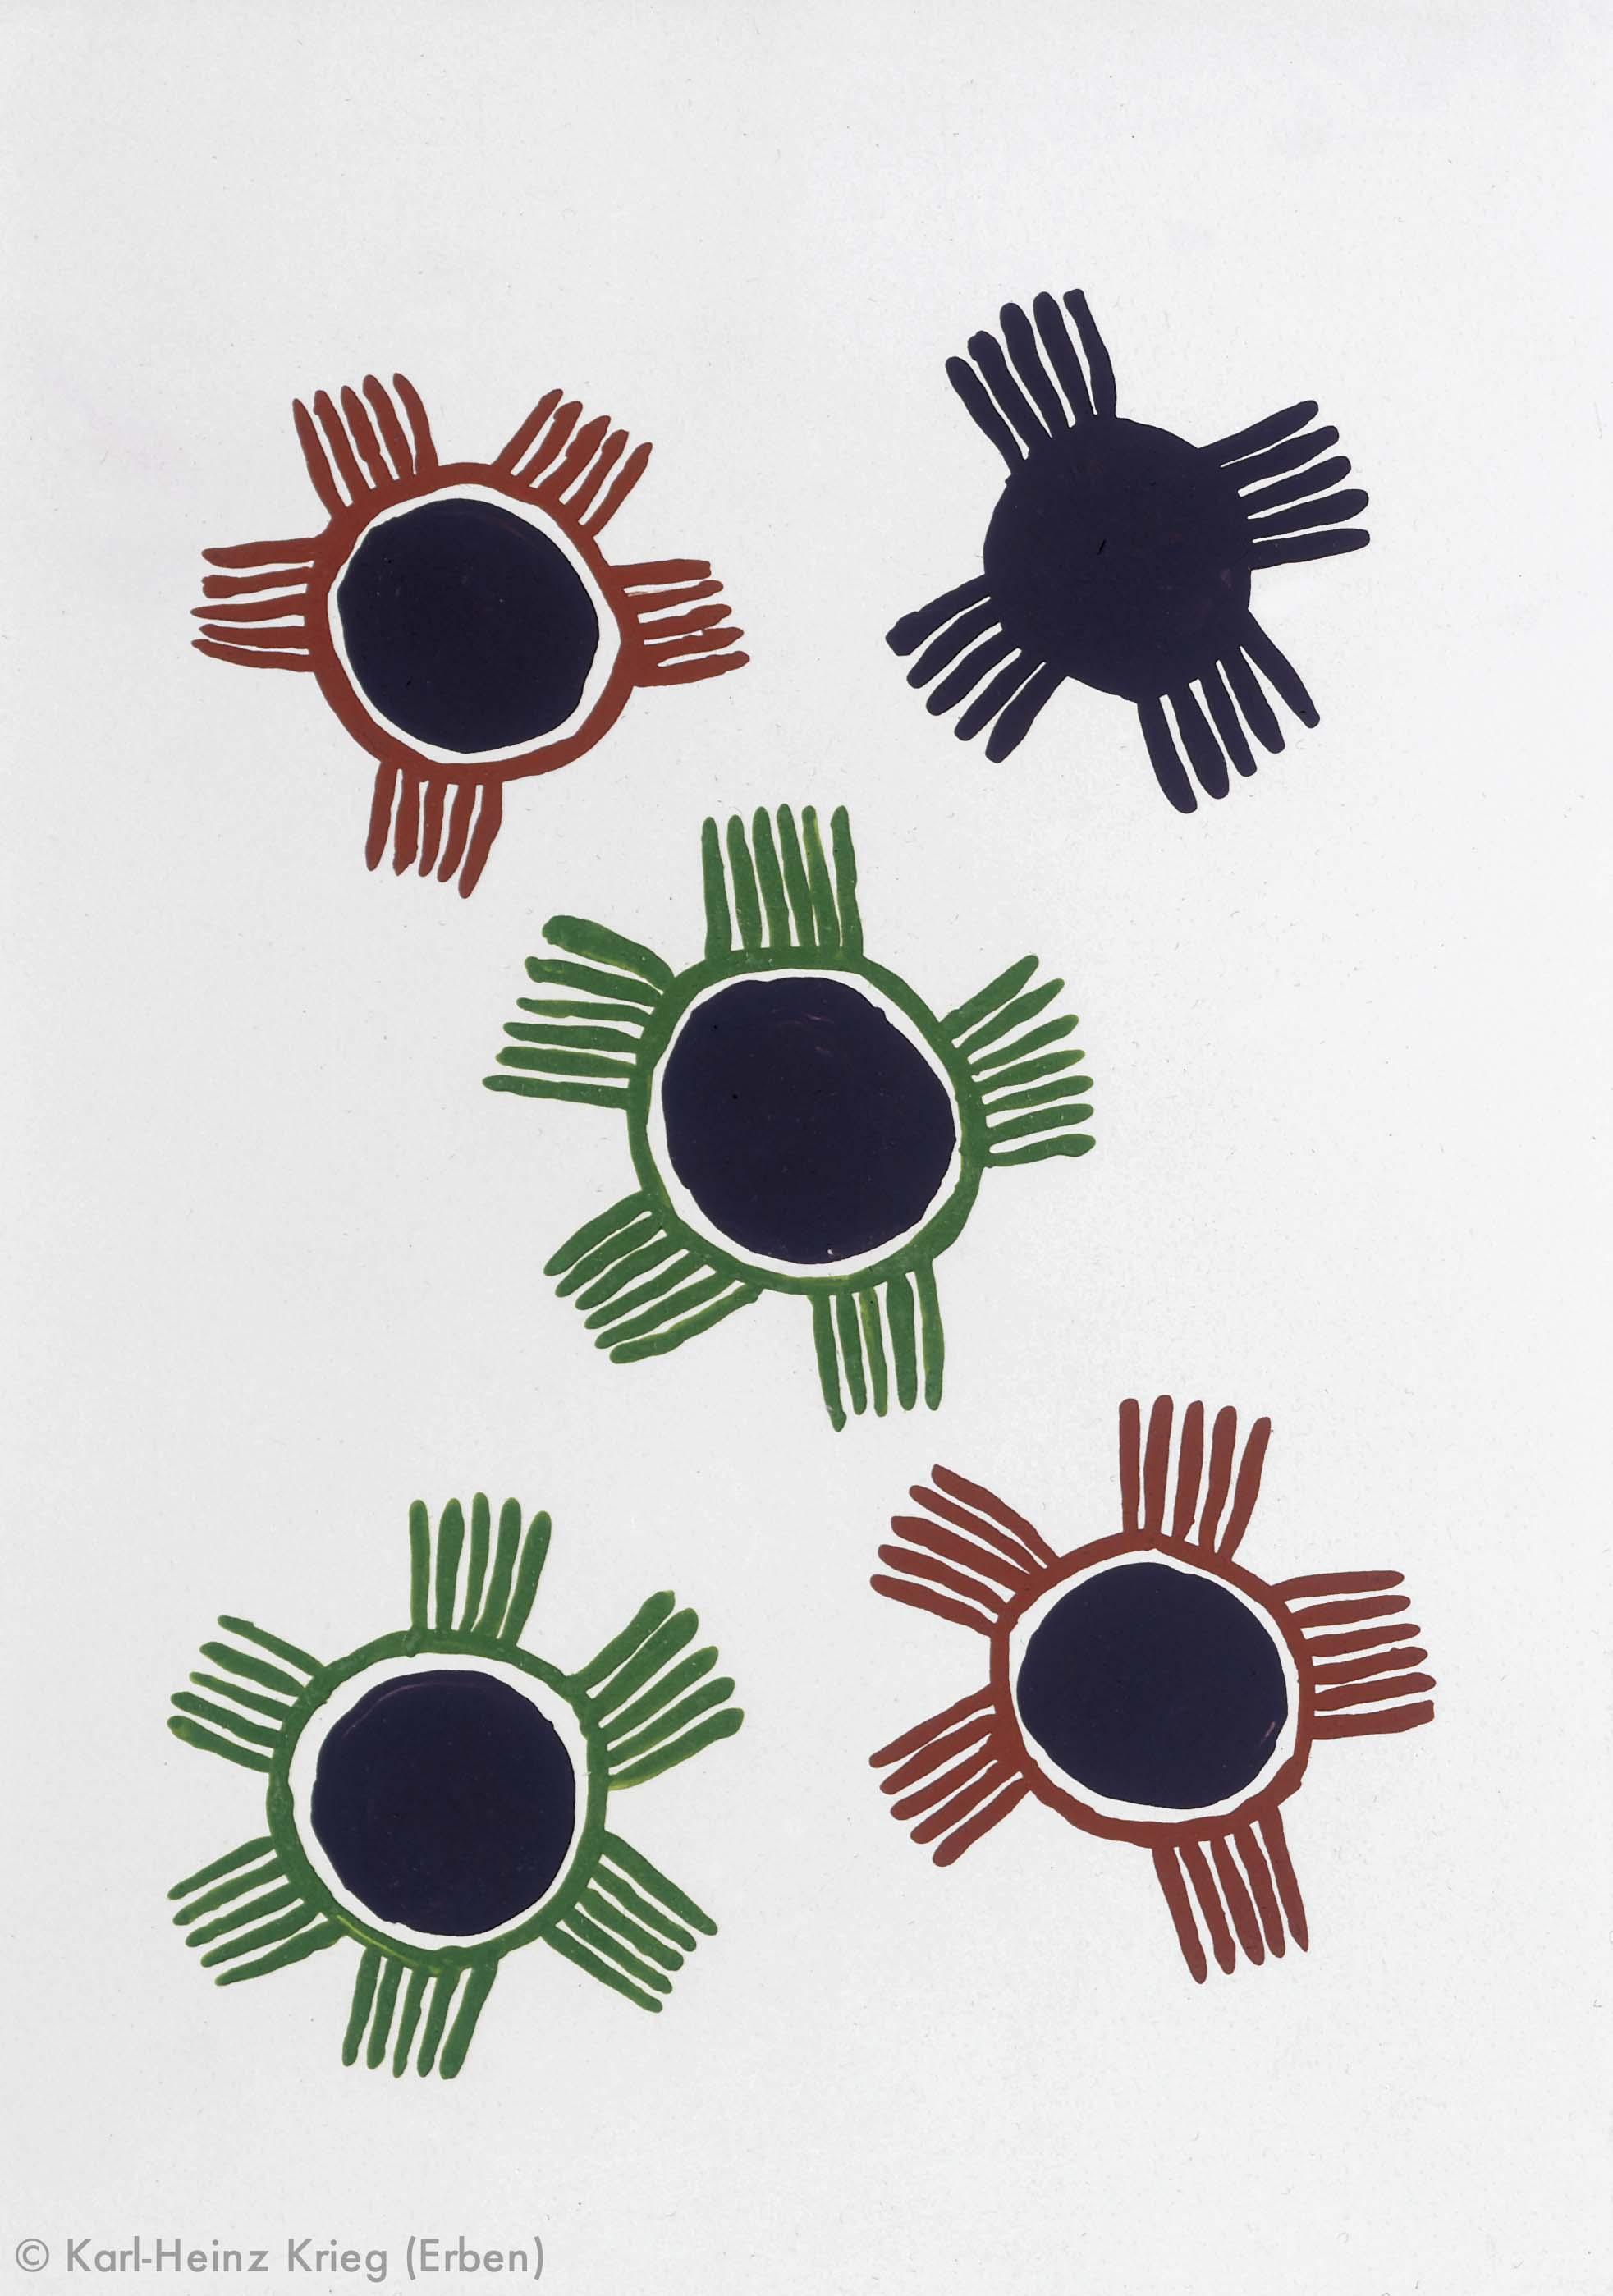 Volo Béavogi Gozokpobhogi, 1996 Acryl/Papier, grundiert 29,5 x 42 cm Werknr. 11-1996/138